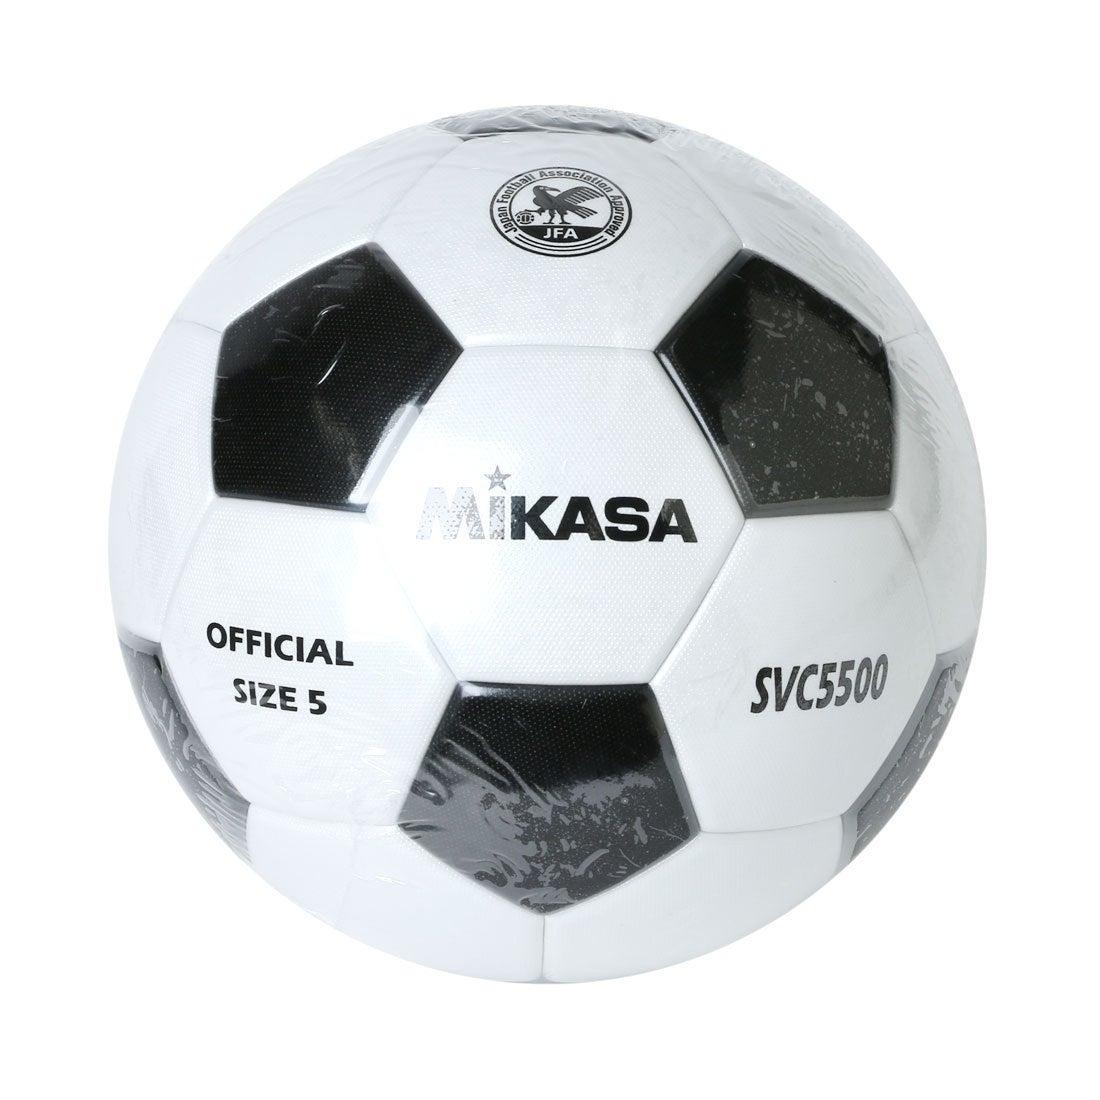 【SALE 7%OFF】ミカサ MIKASA ユニセックス サッカー 試合球 SVC5500-WBK SVC5500-WB